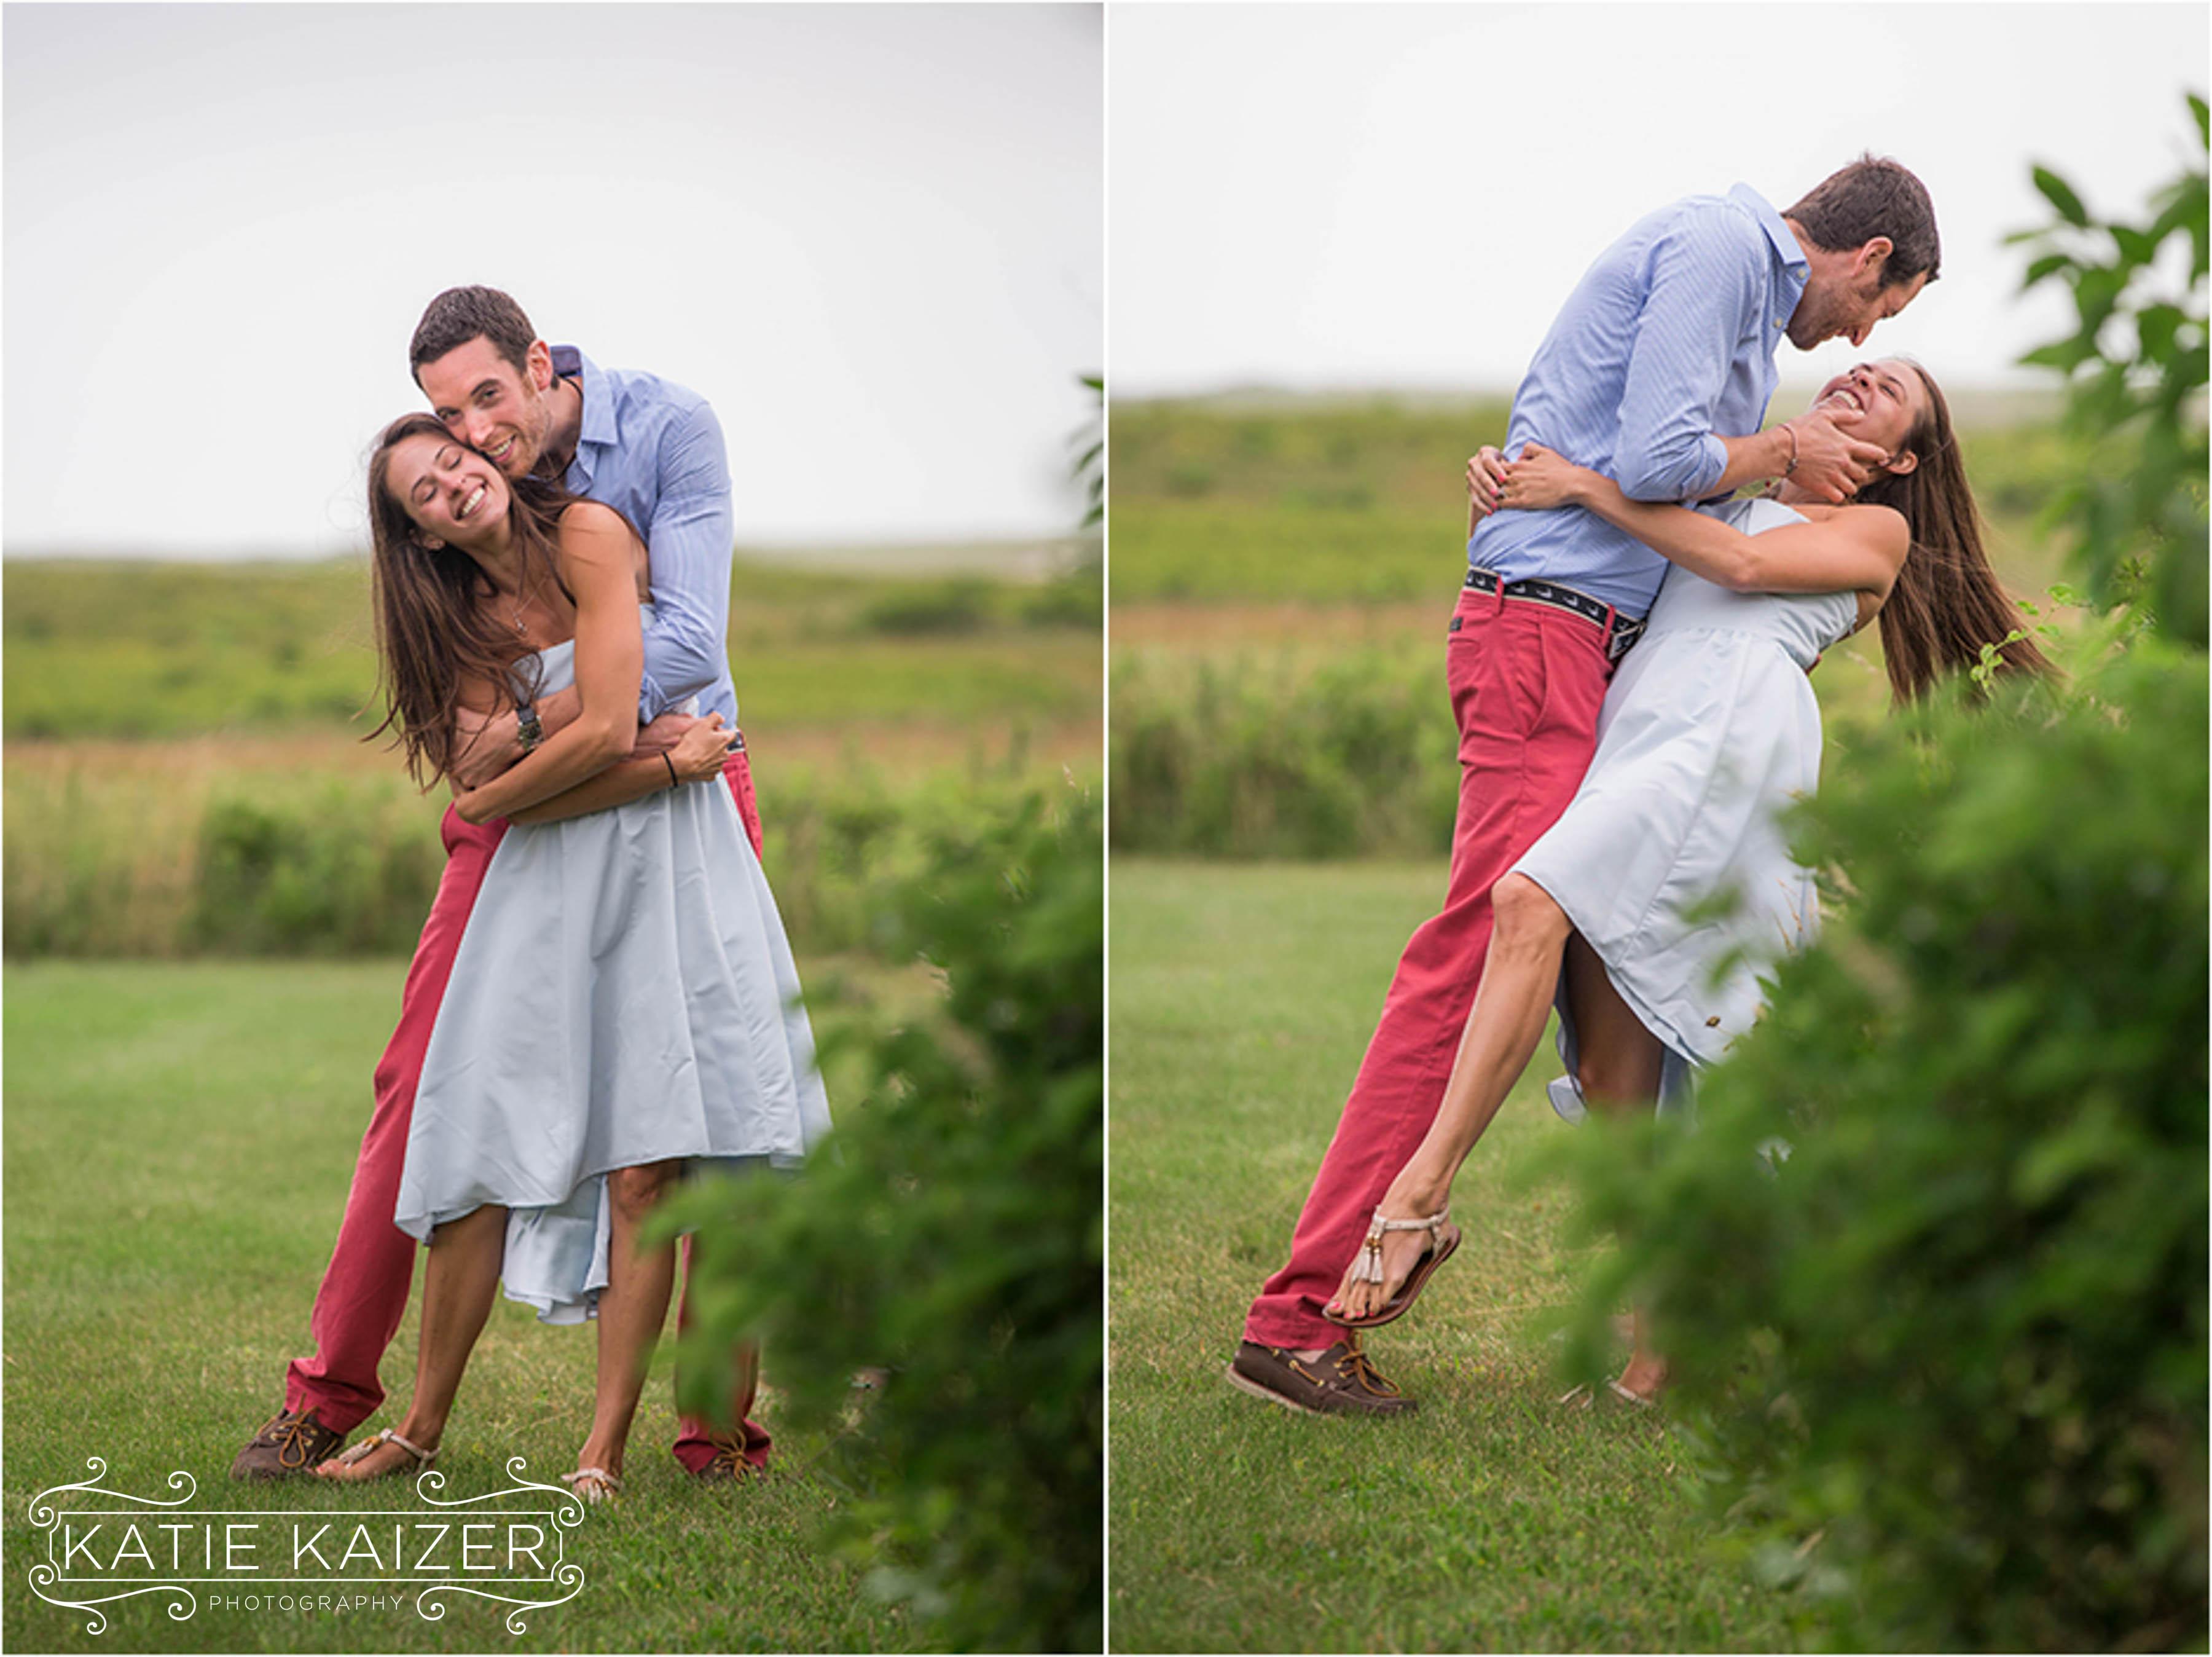 Meghan&Zach_004_KatieKaizerPhotography